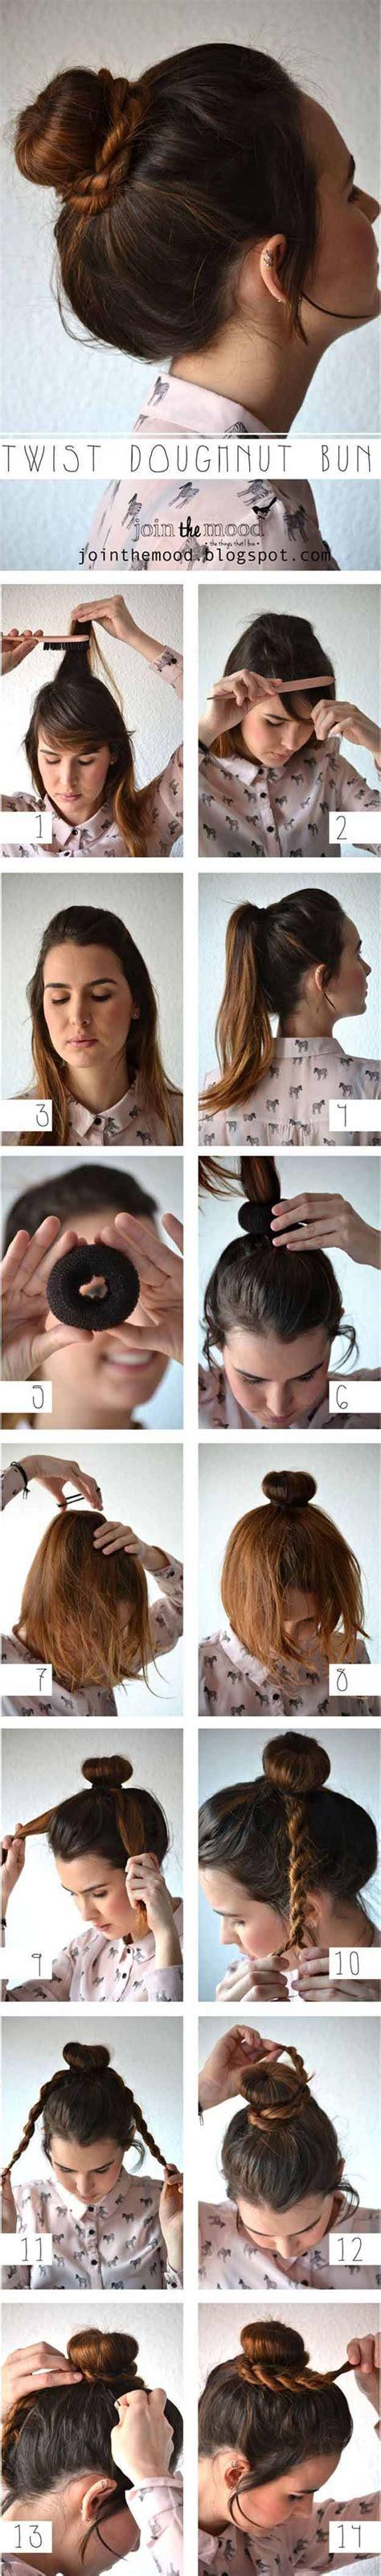 Best 25+ Short Teen Hairstyles Ideas On Pinterest Boys